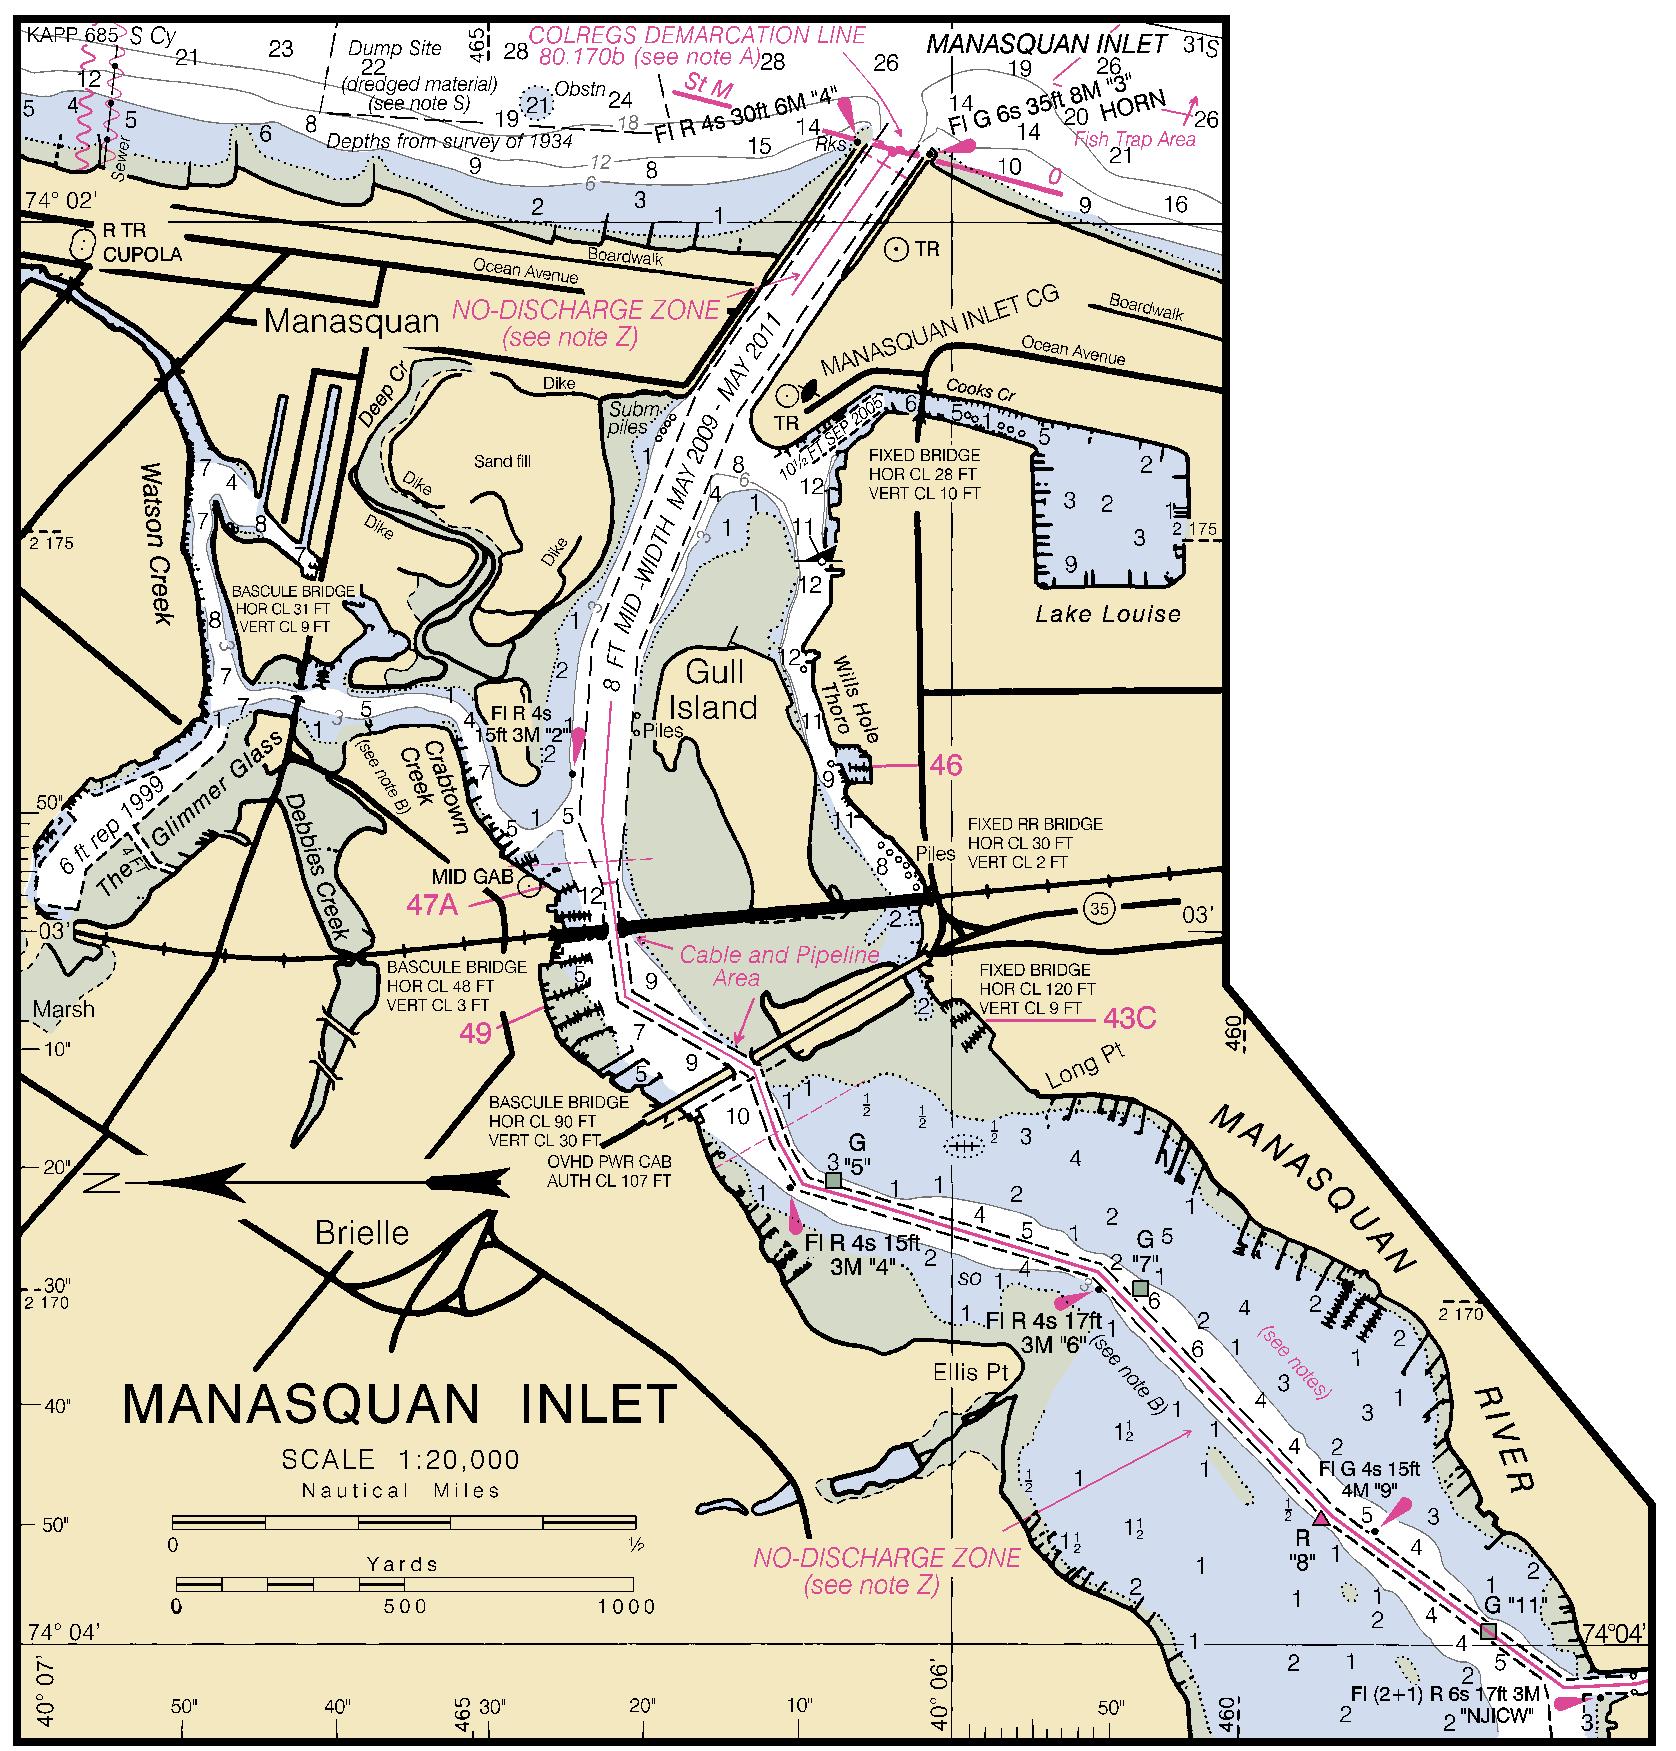 MANASQUAN INLET Nautical Chart   Charts  Maps